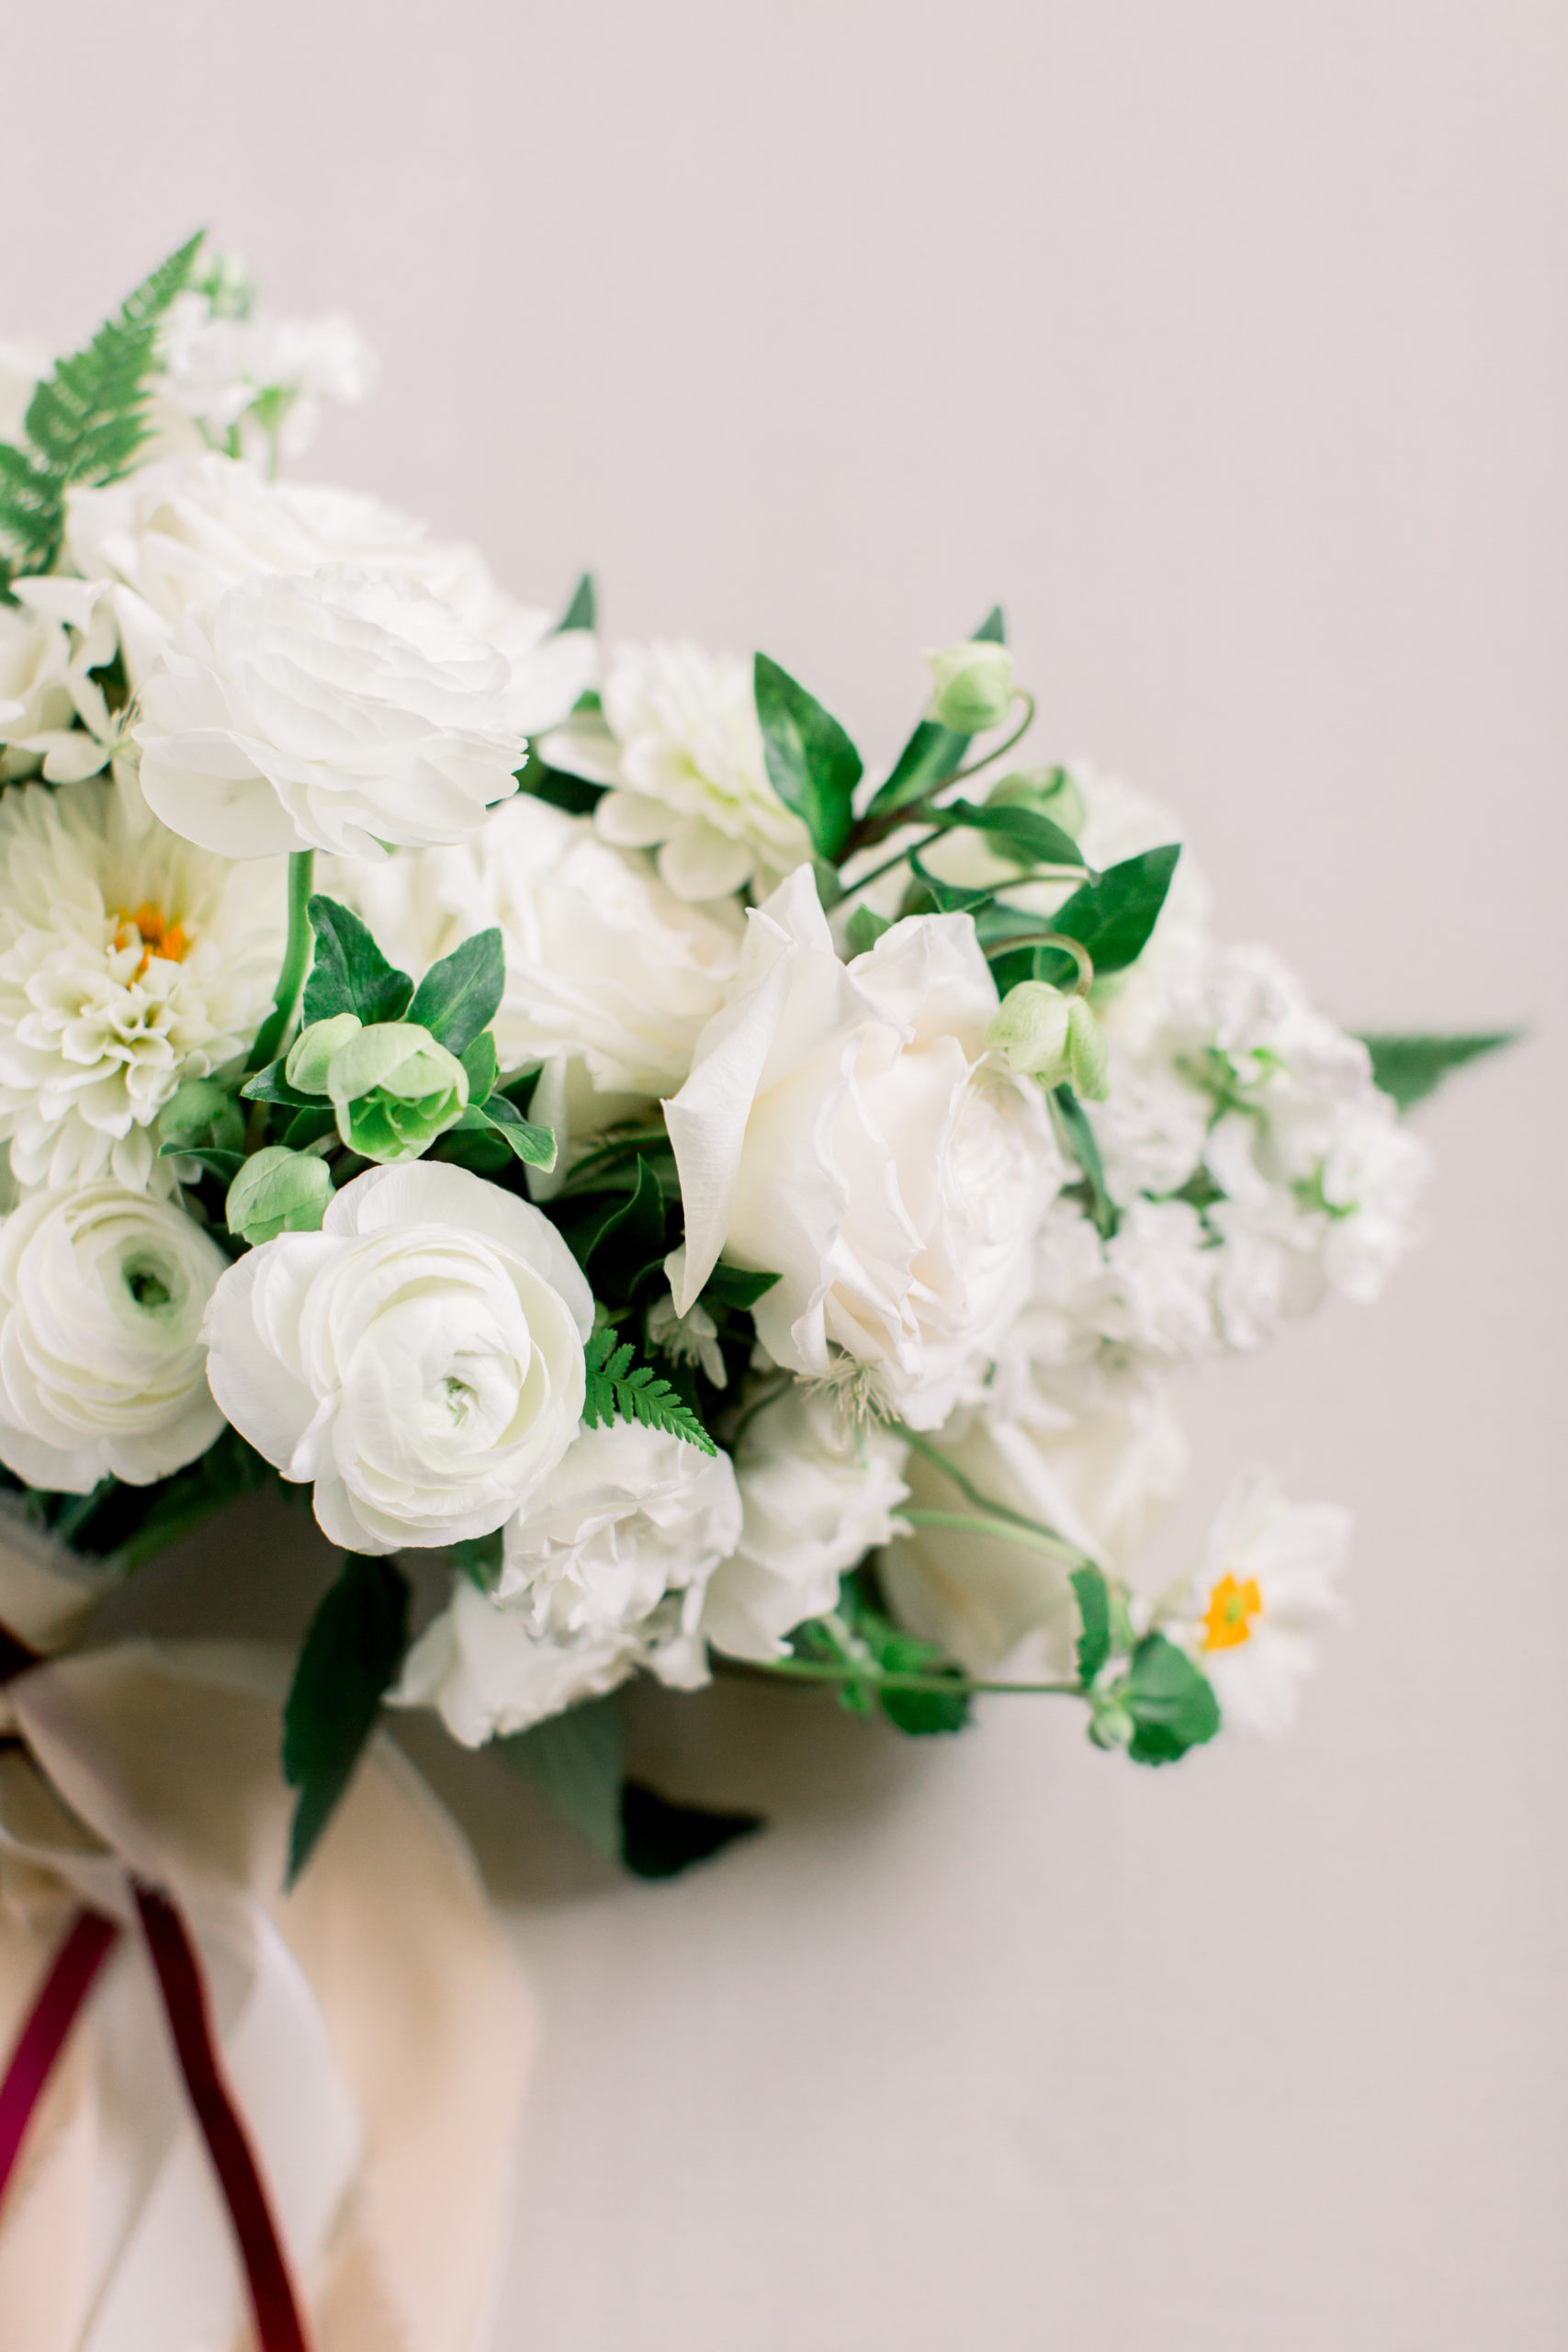 DC Wedding Florist, DC Florist, VA Wedding Florist, Virginia Florist, Styled Shoot, Wedding Inspiration, Bride